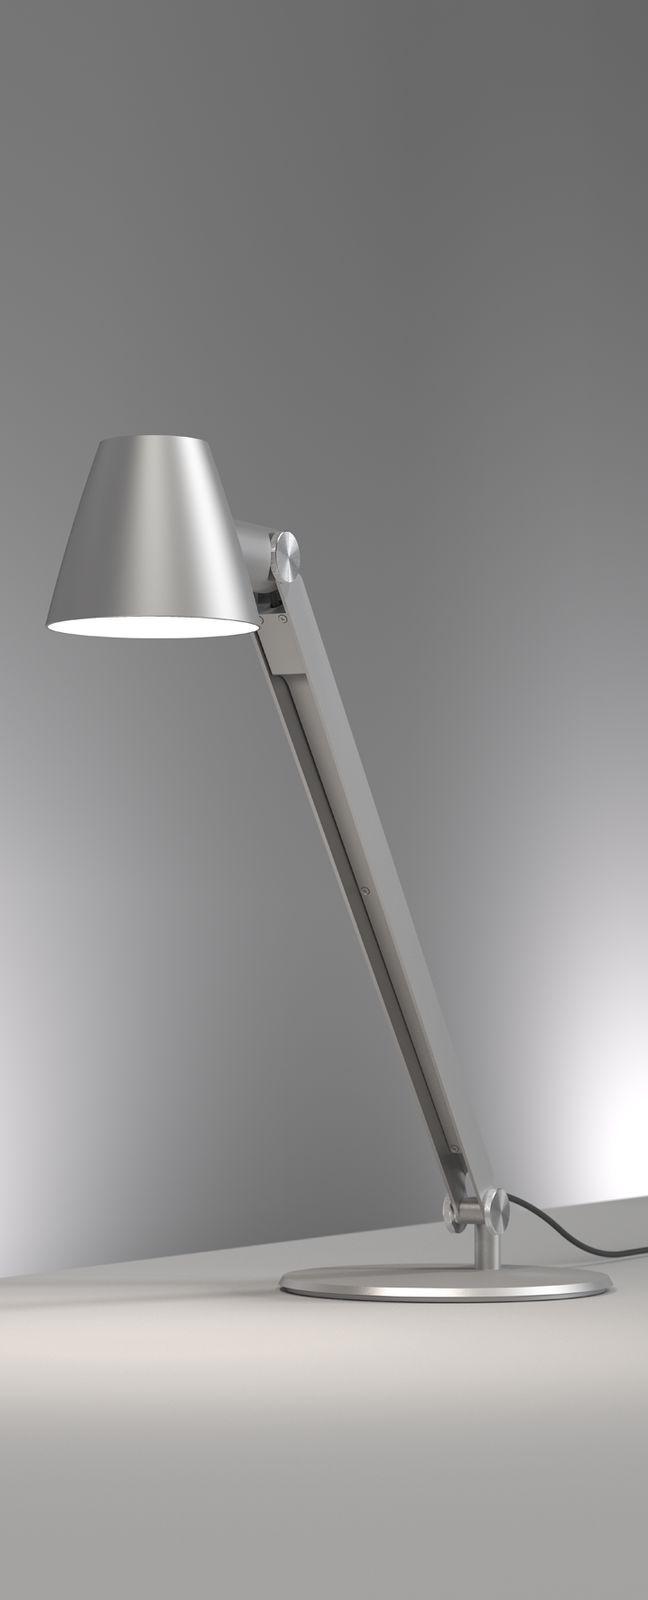 best cult range images on pinterest  range headboard lights  - nordlux's cult adjustable grey desk lamp  modern contemporary lightscandinavian design